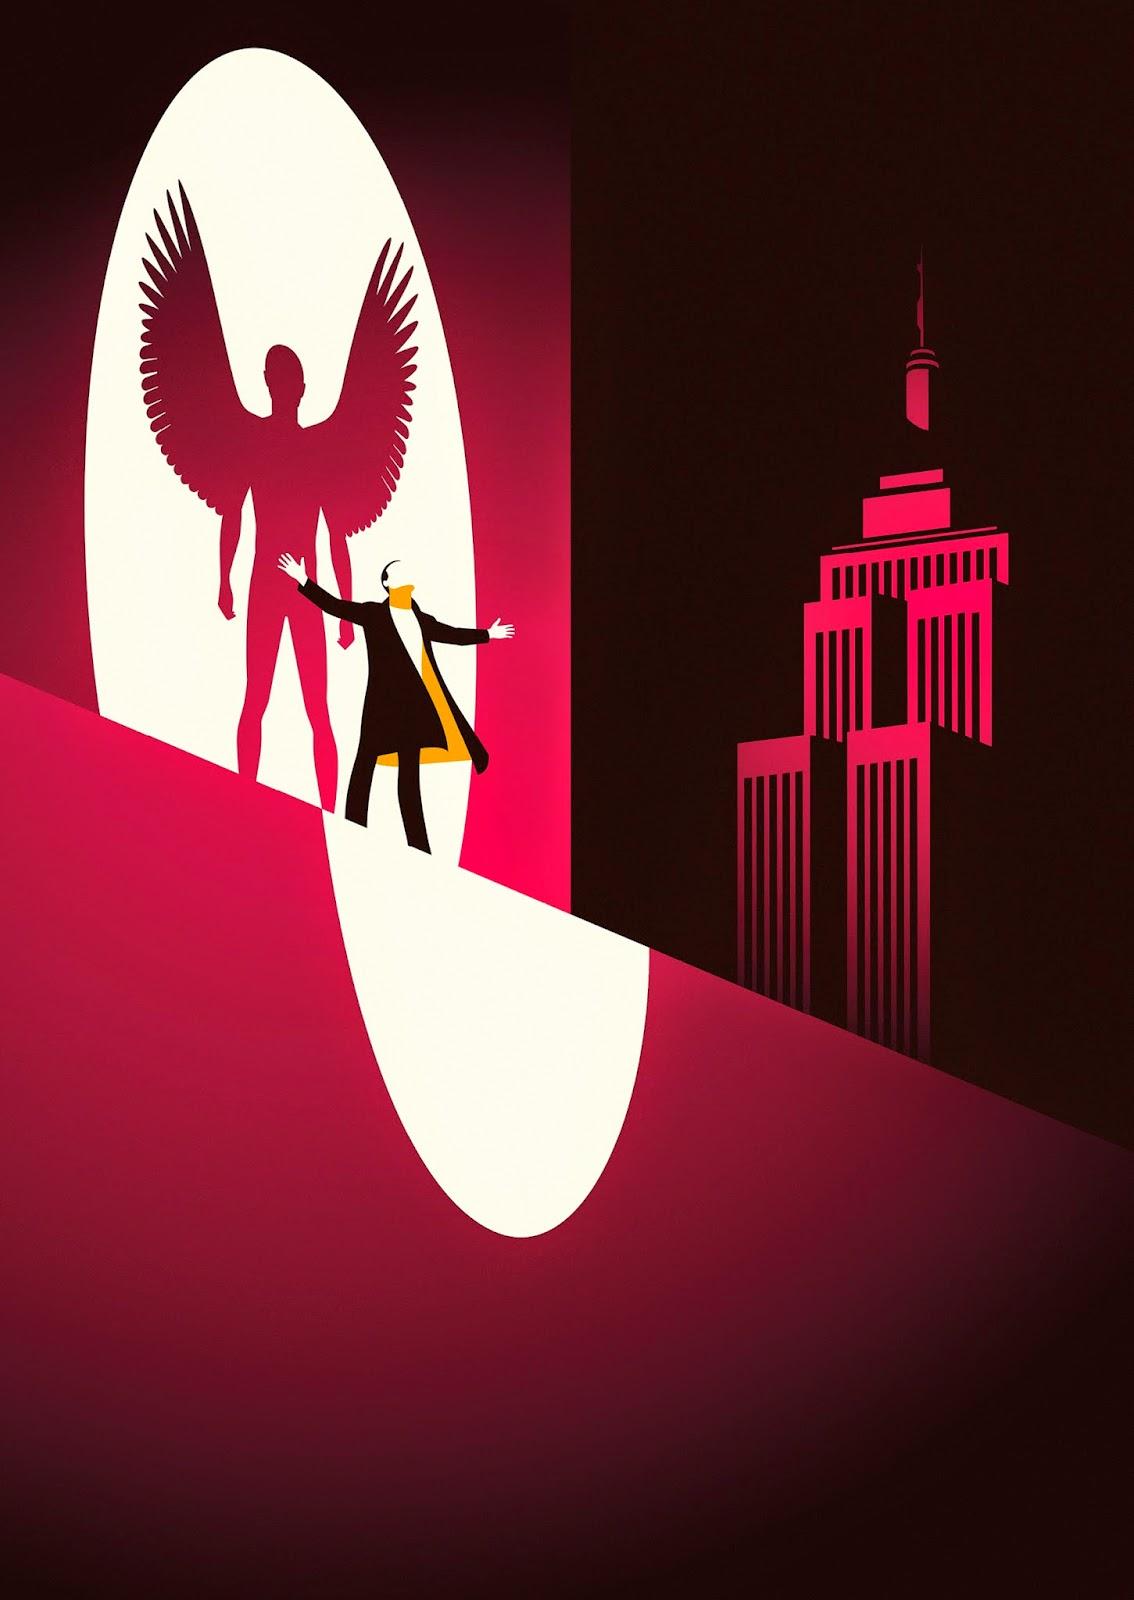 Malika Favre BAFTA Birdman Poster